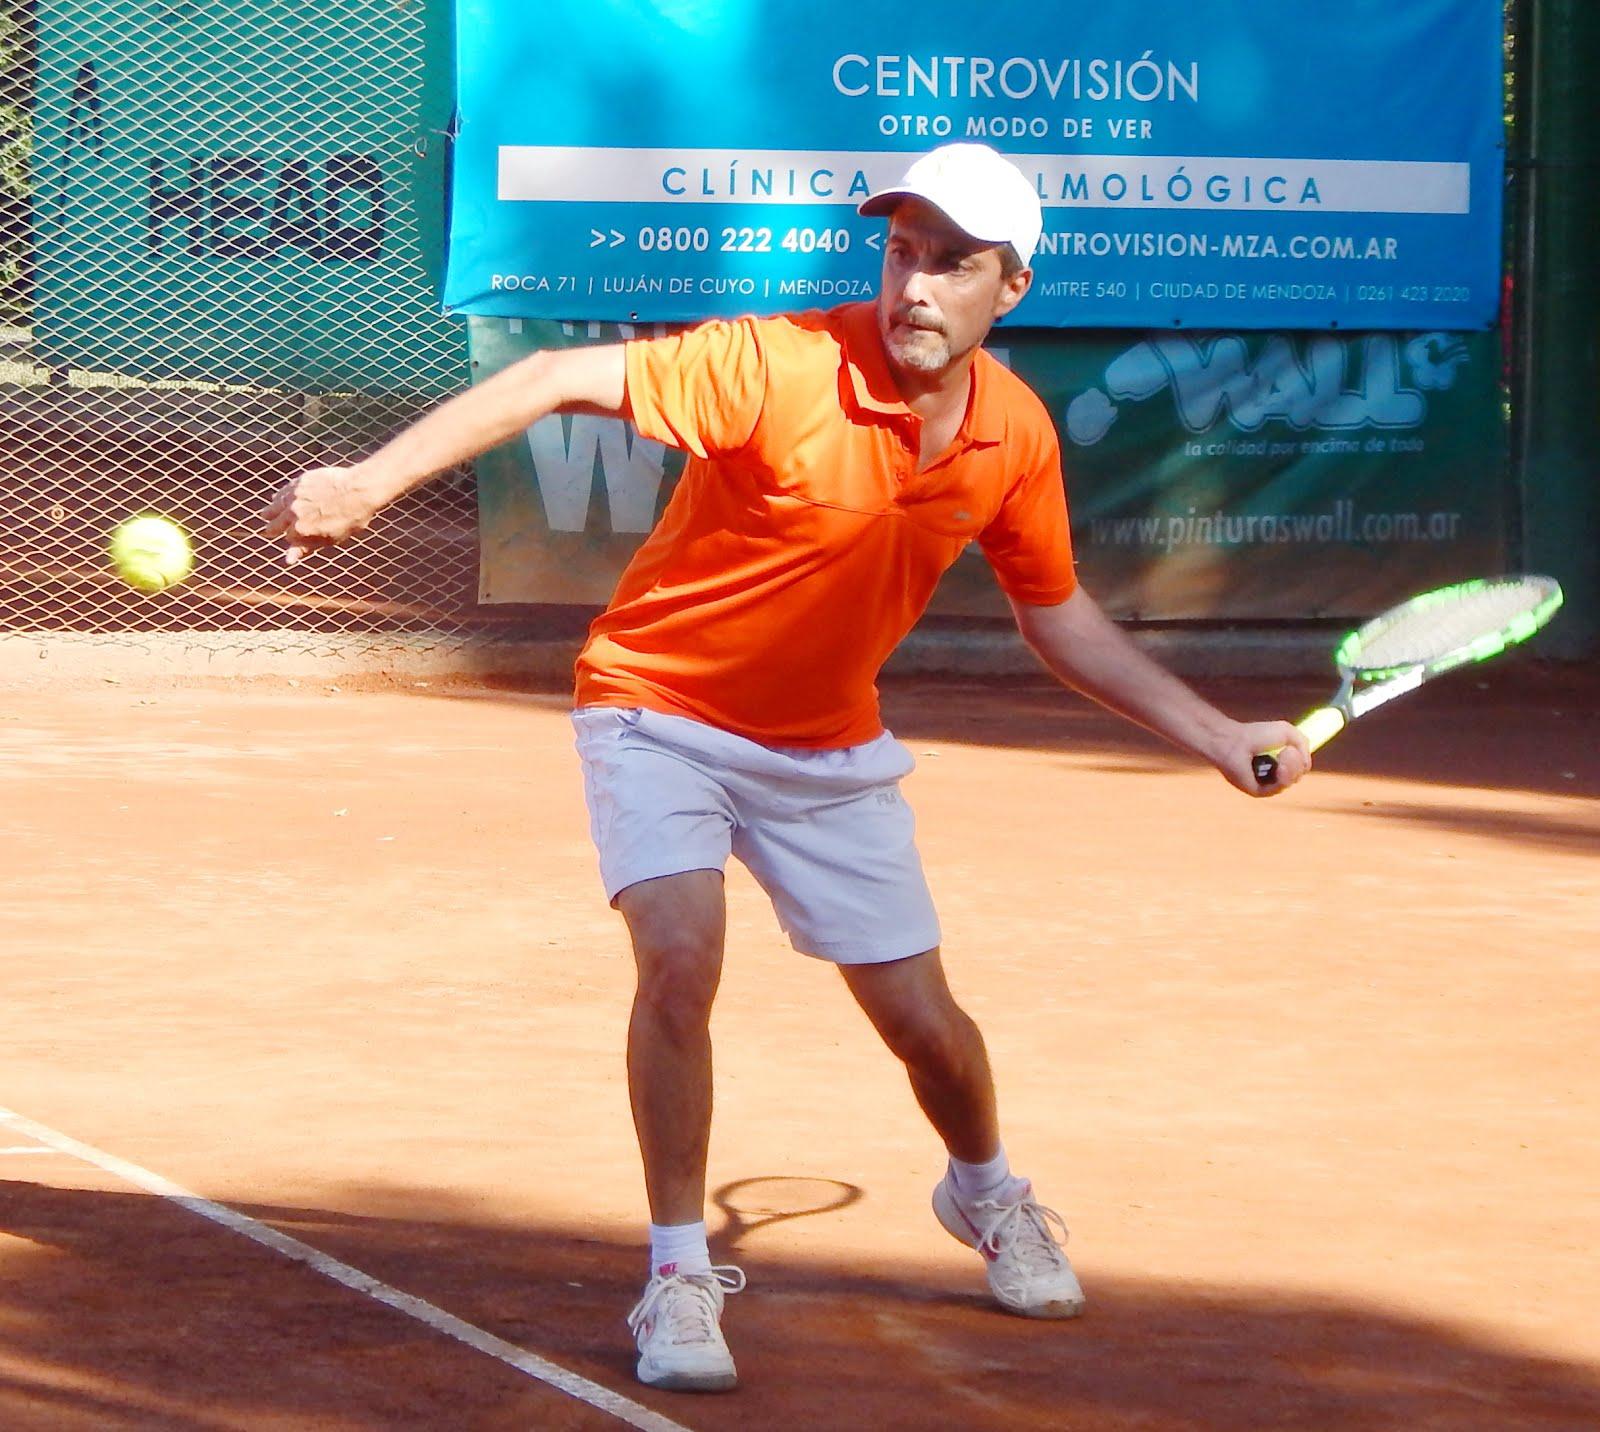 CAMPEON +50 ITF SENIORS - COPA ANIVERSARIO